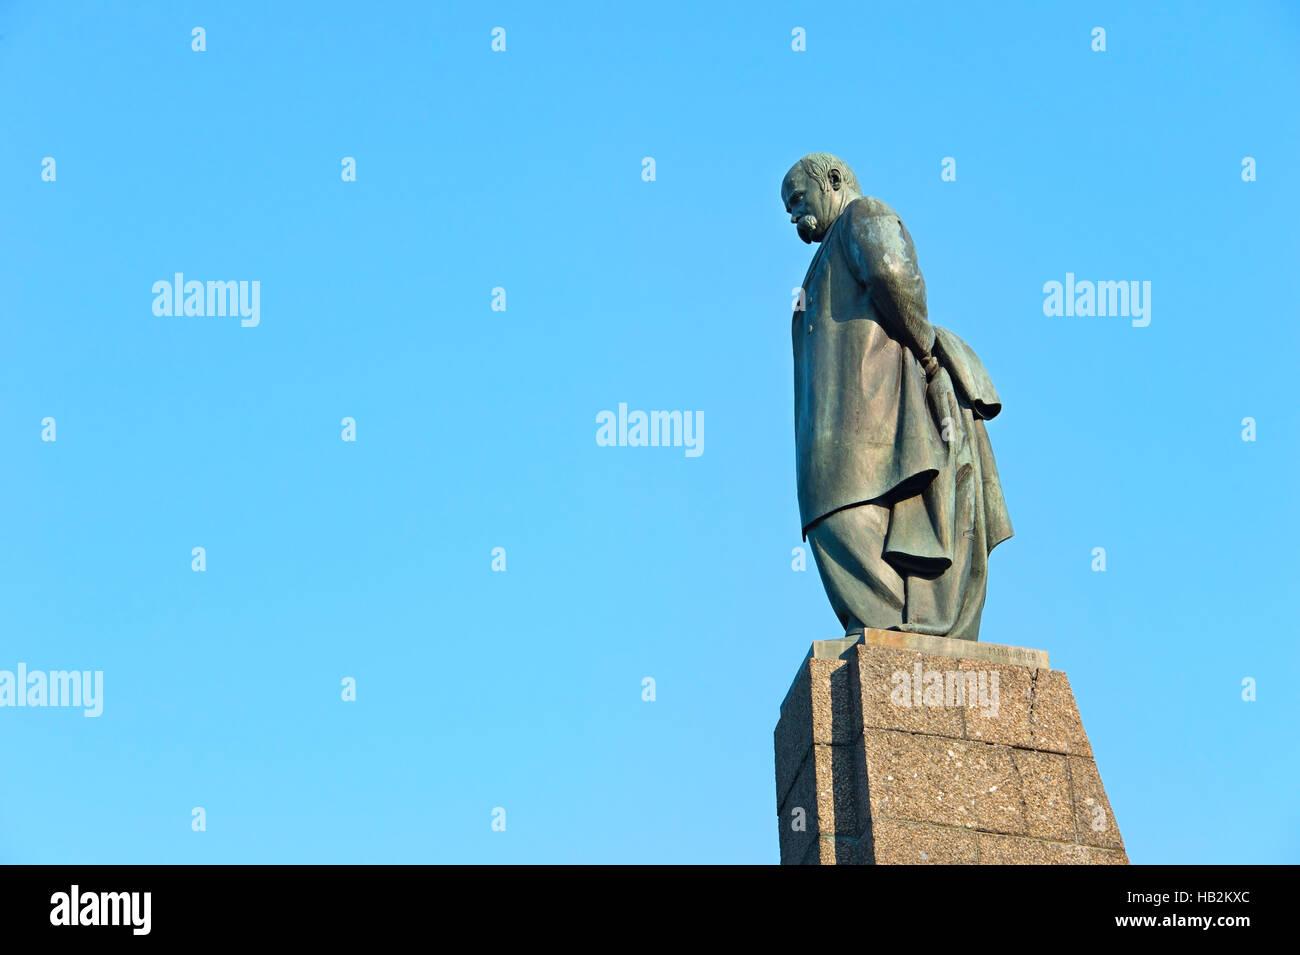 Monument of Taras Shevchenko in Kaniv - Stock Image